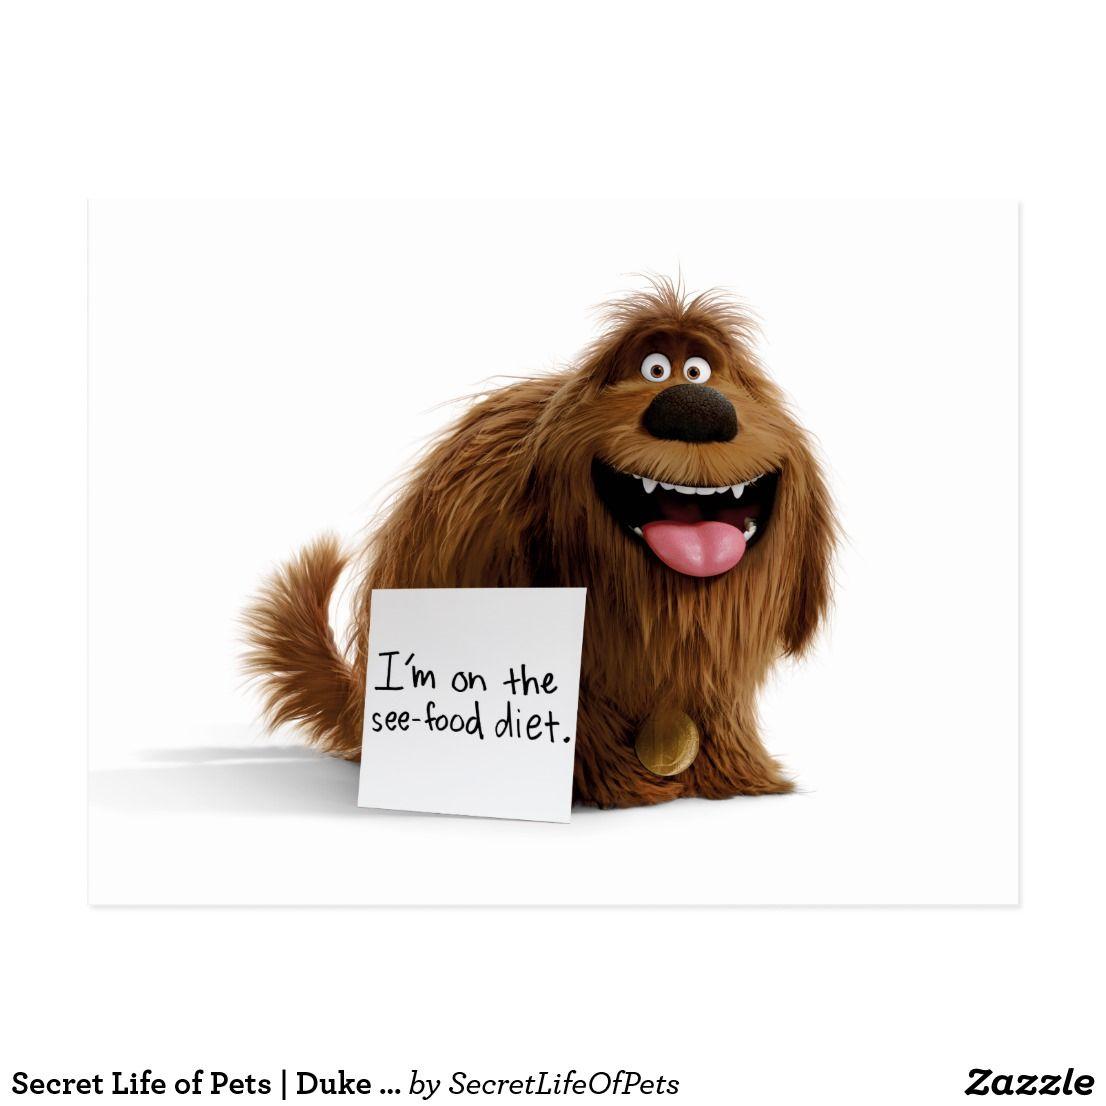 Secret Life Of Pets Duke See Food Diet Postcard Zazzle Com In